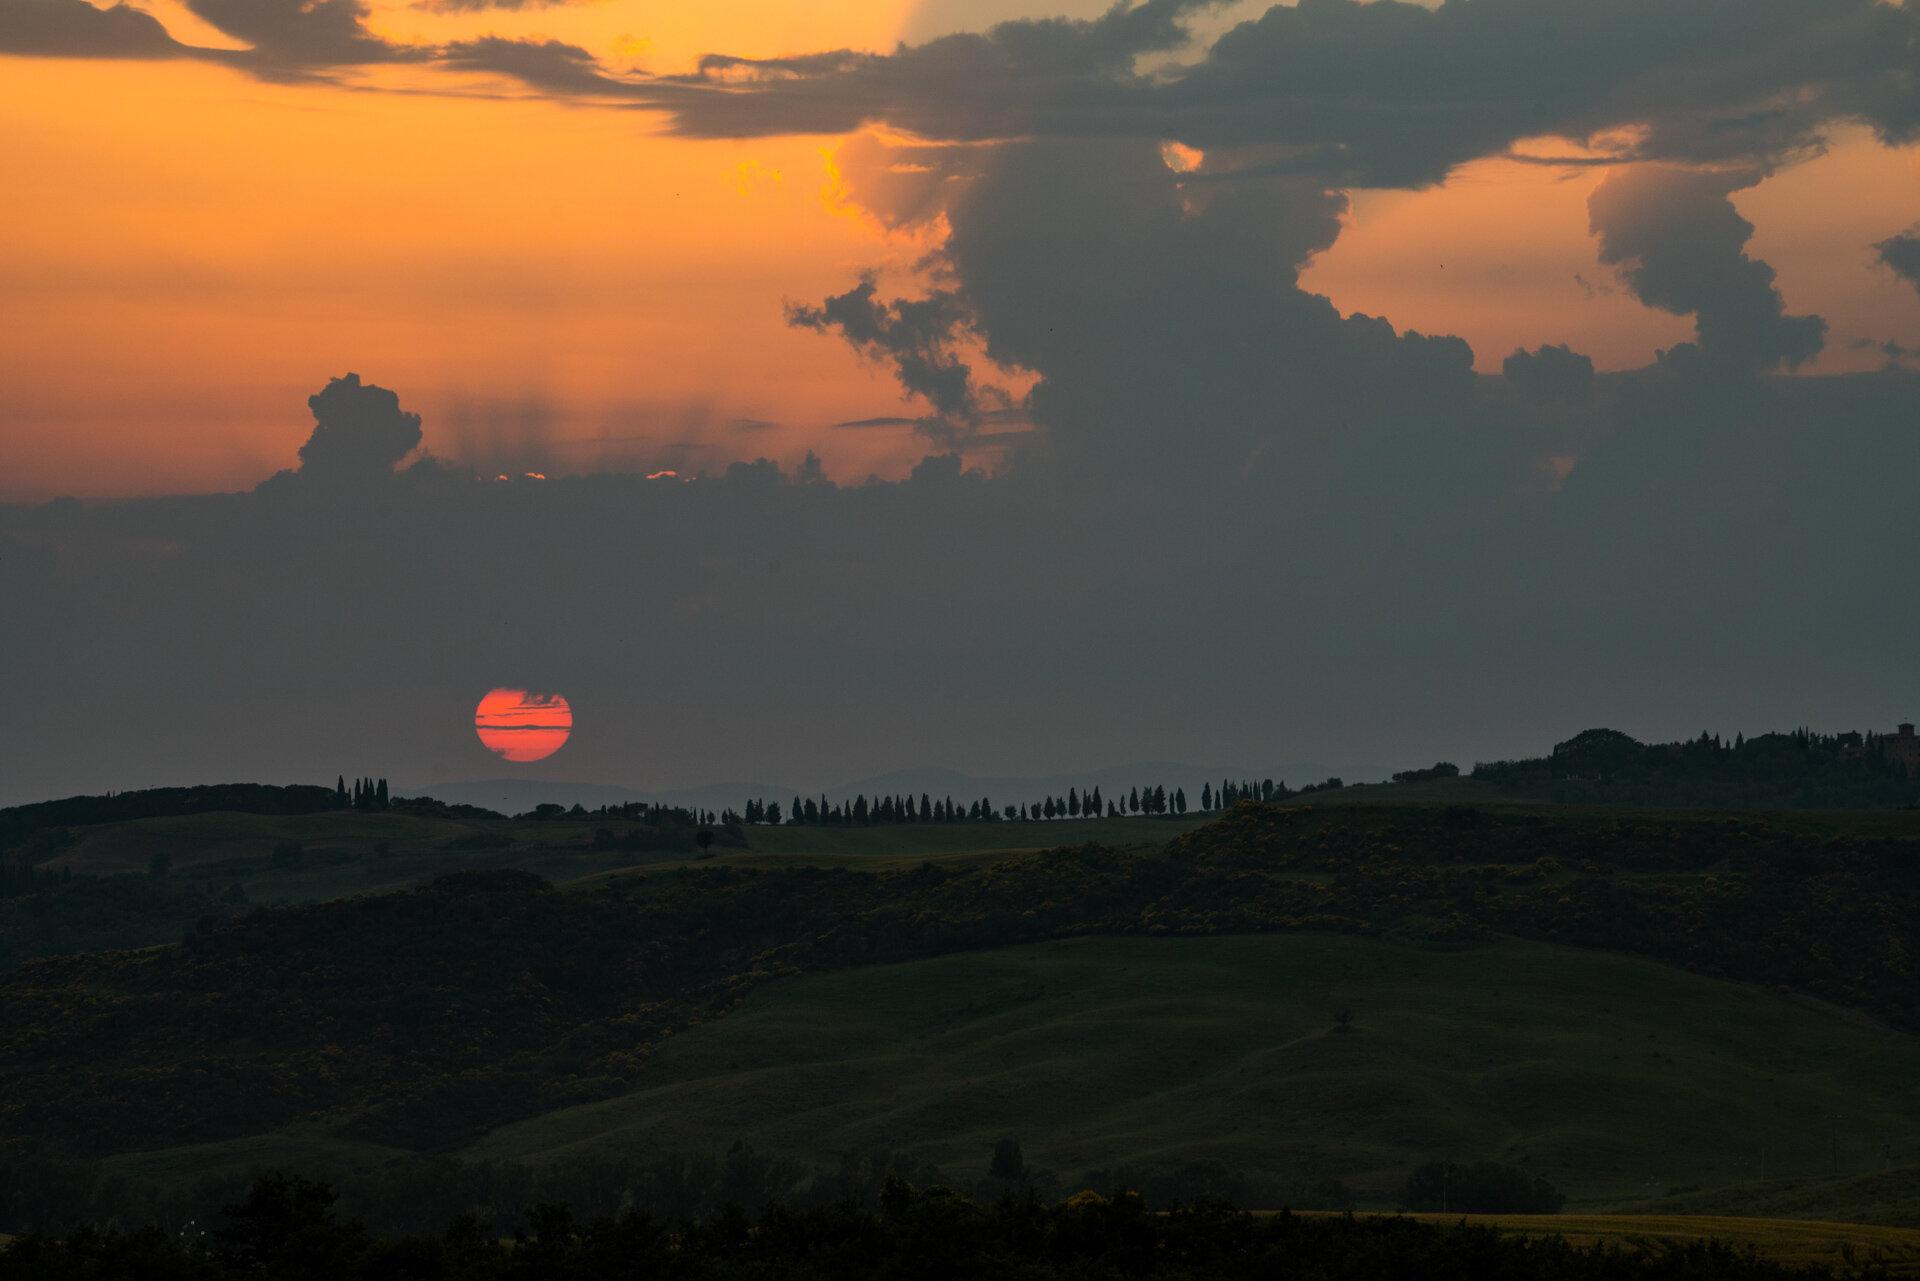 Sunrise at Podere Belvedere Valley  PHOTOGRAPHY: MIRKO FIN • Sony Alpha 7R MkIII • SONY FE 70-200mm Ƒ/4 G OSS @ 200MM • Ƒ/11 • 1/125 sec • ISO 400